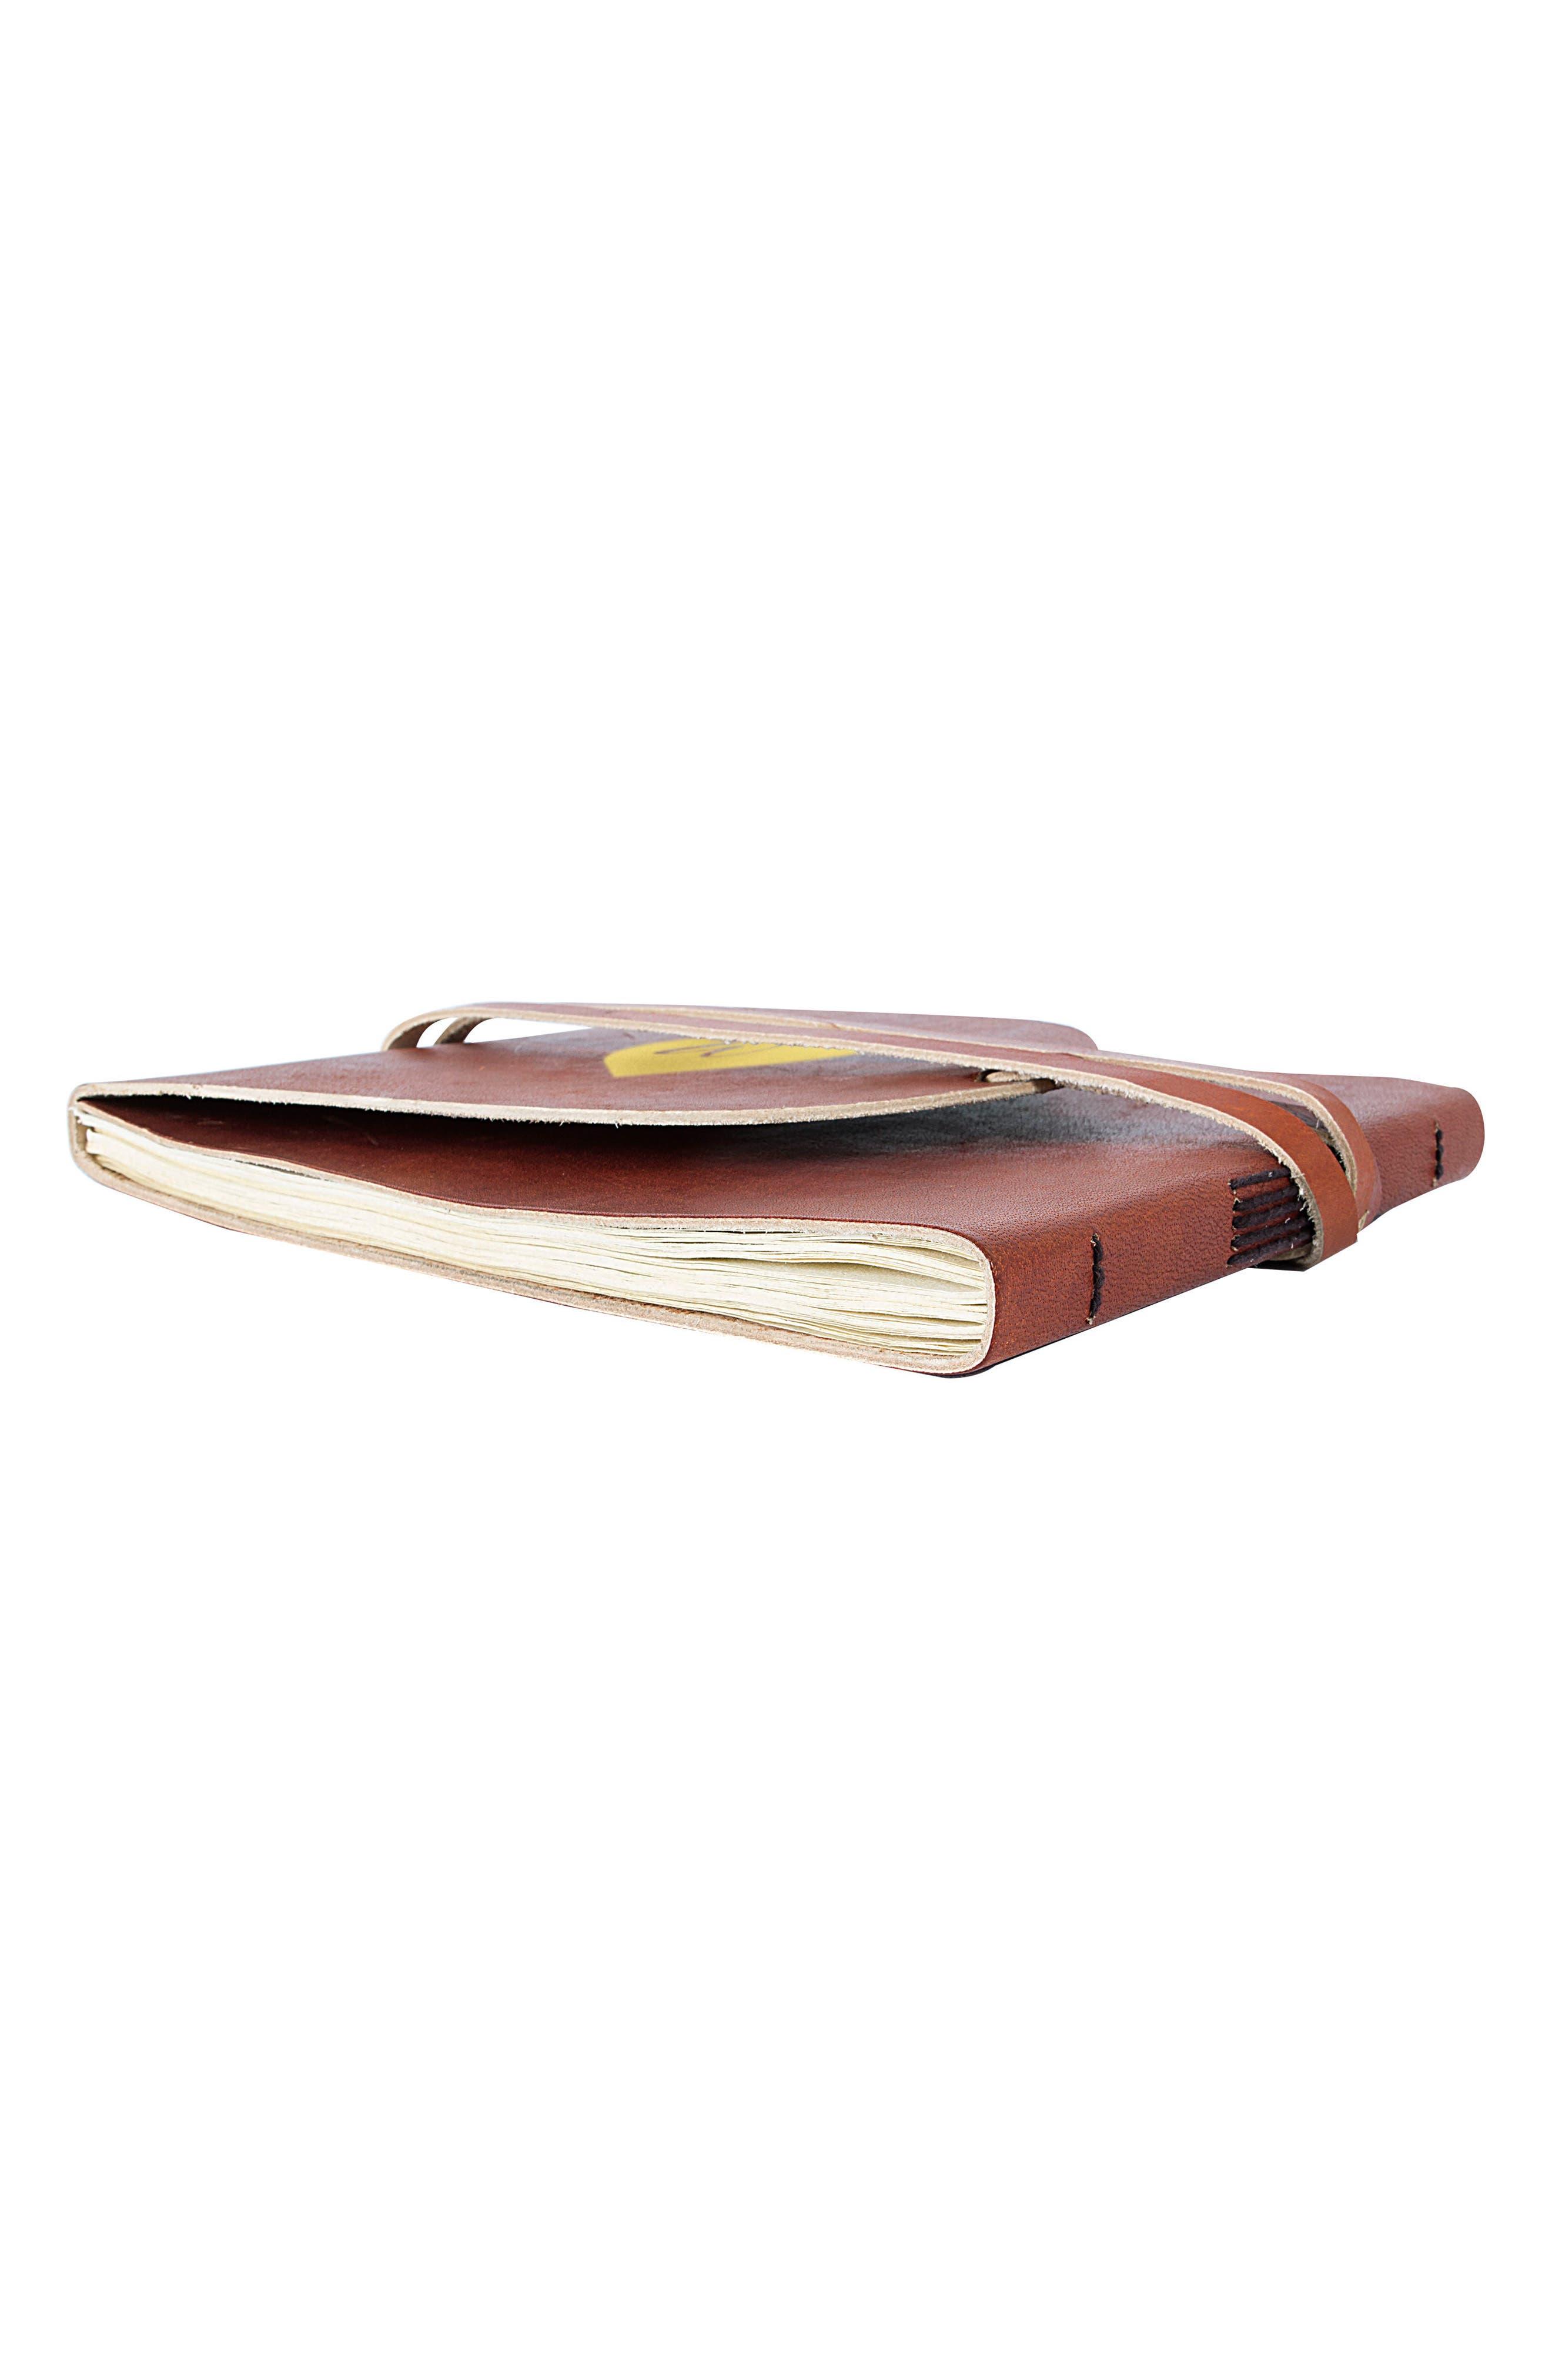 Monogram Leather Guest Book,                             Alternate thumbnail 5, color,                             710